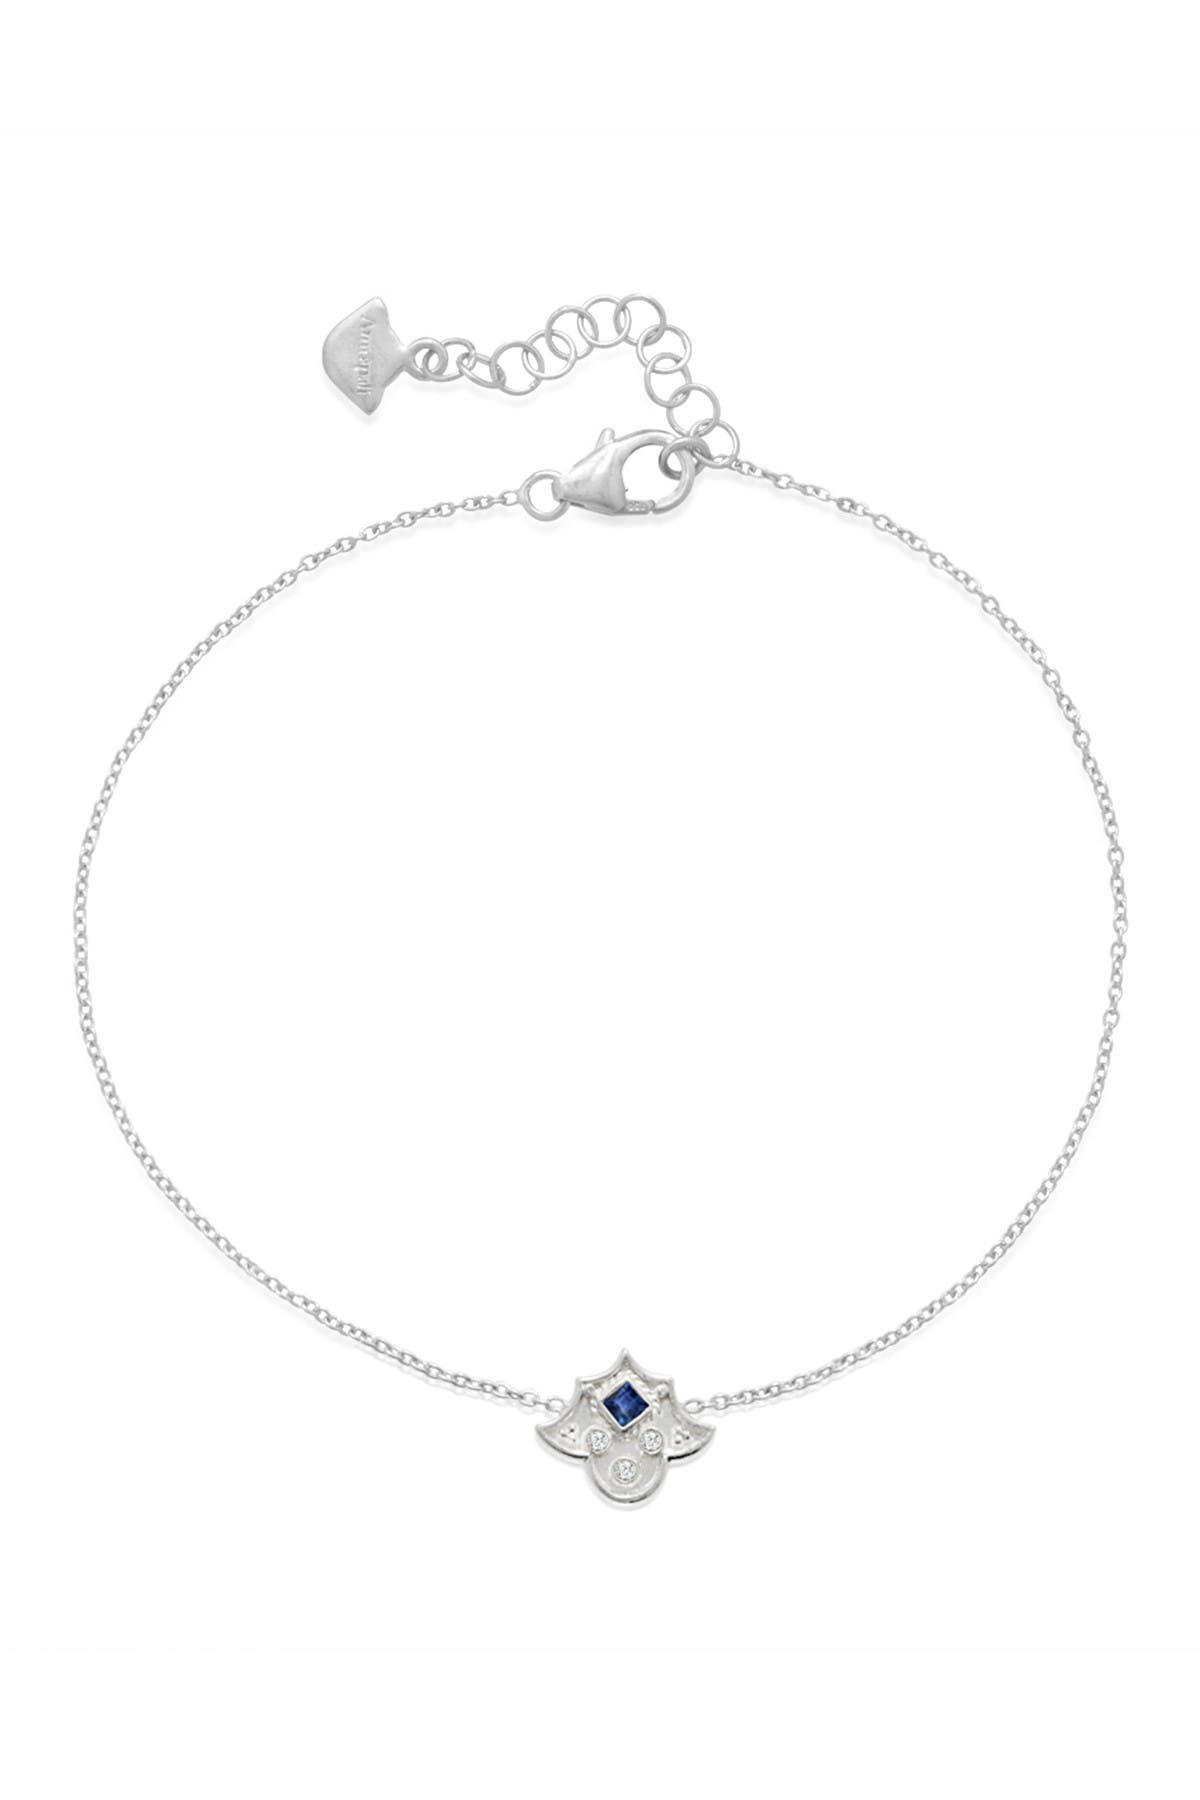 Image of LEGEND AMRAPALI SILVER Sterling Silver Heritage Amulet Blue Sapphire & Diamond Station Bracelet